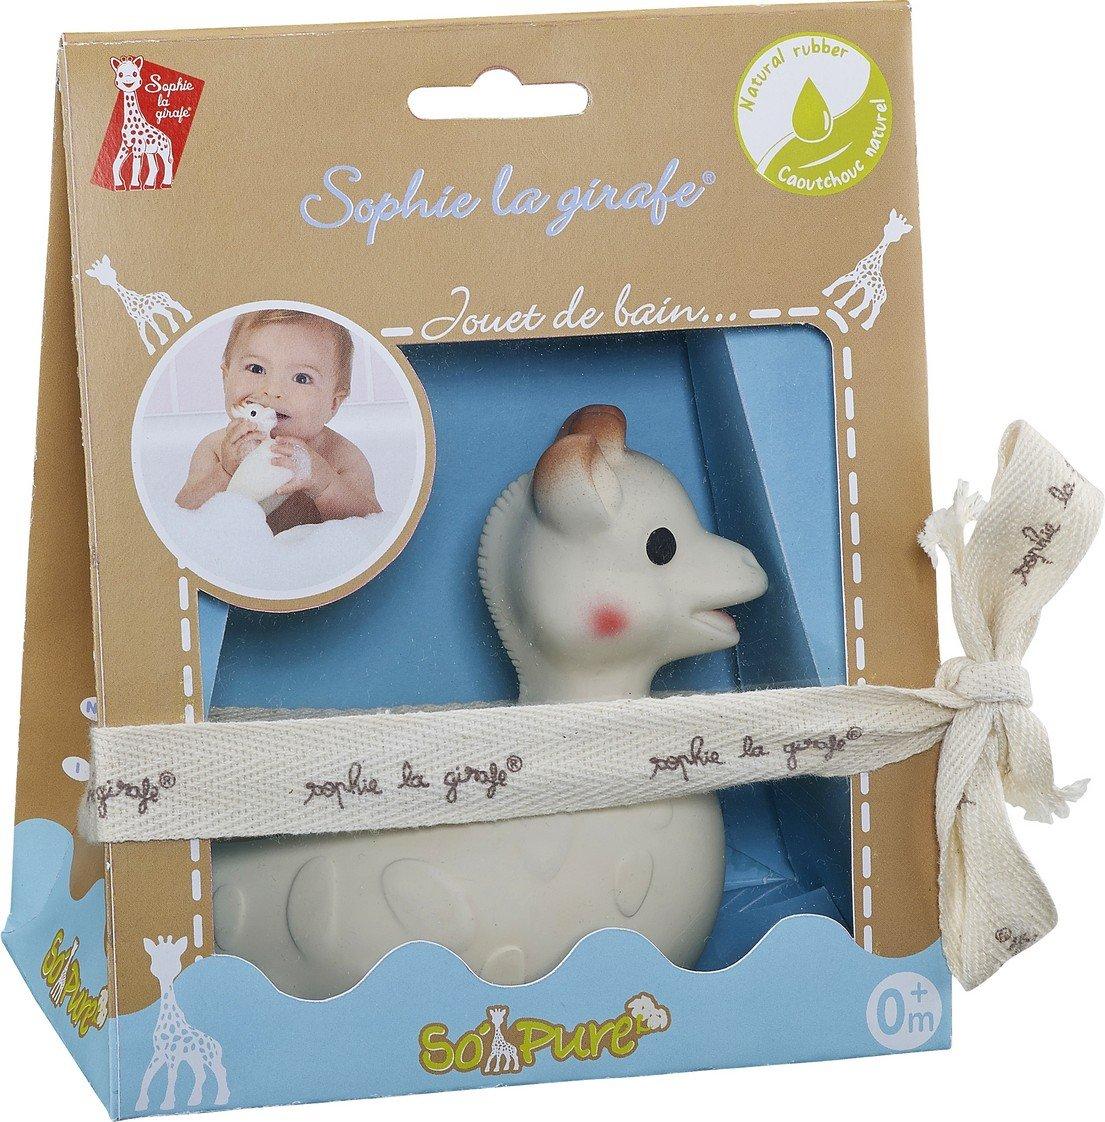 Sophie la girafe - Juguete de baño, 100% hevea Natural (Vulli 220118) bb bebé caucho grenadine